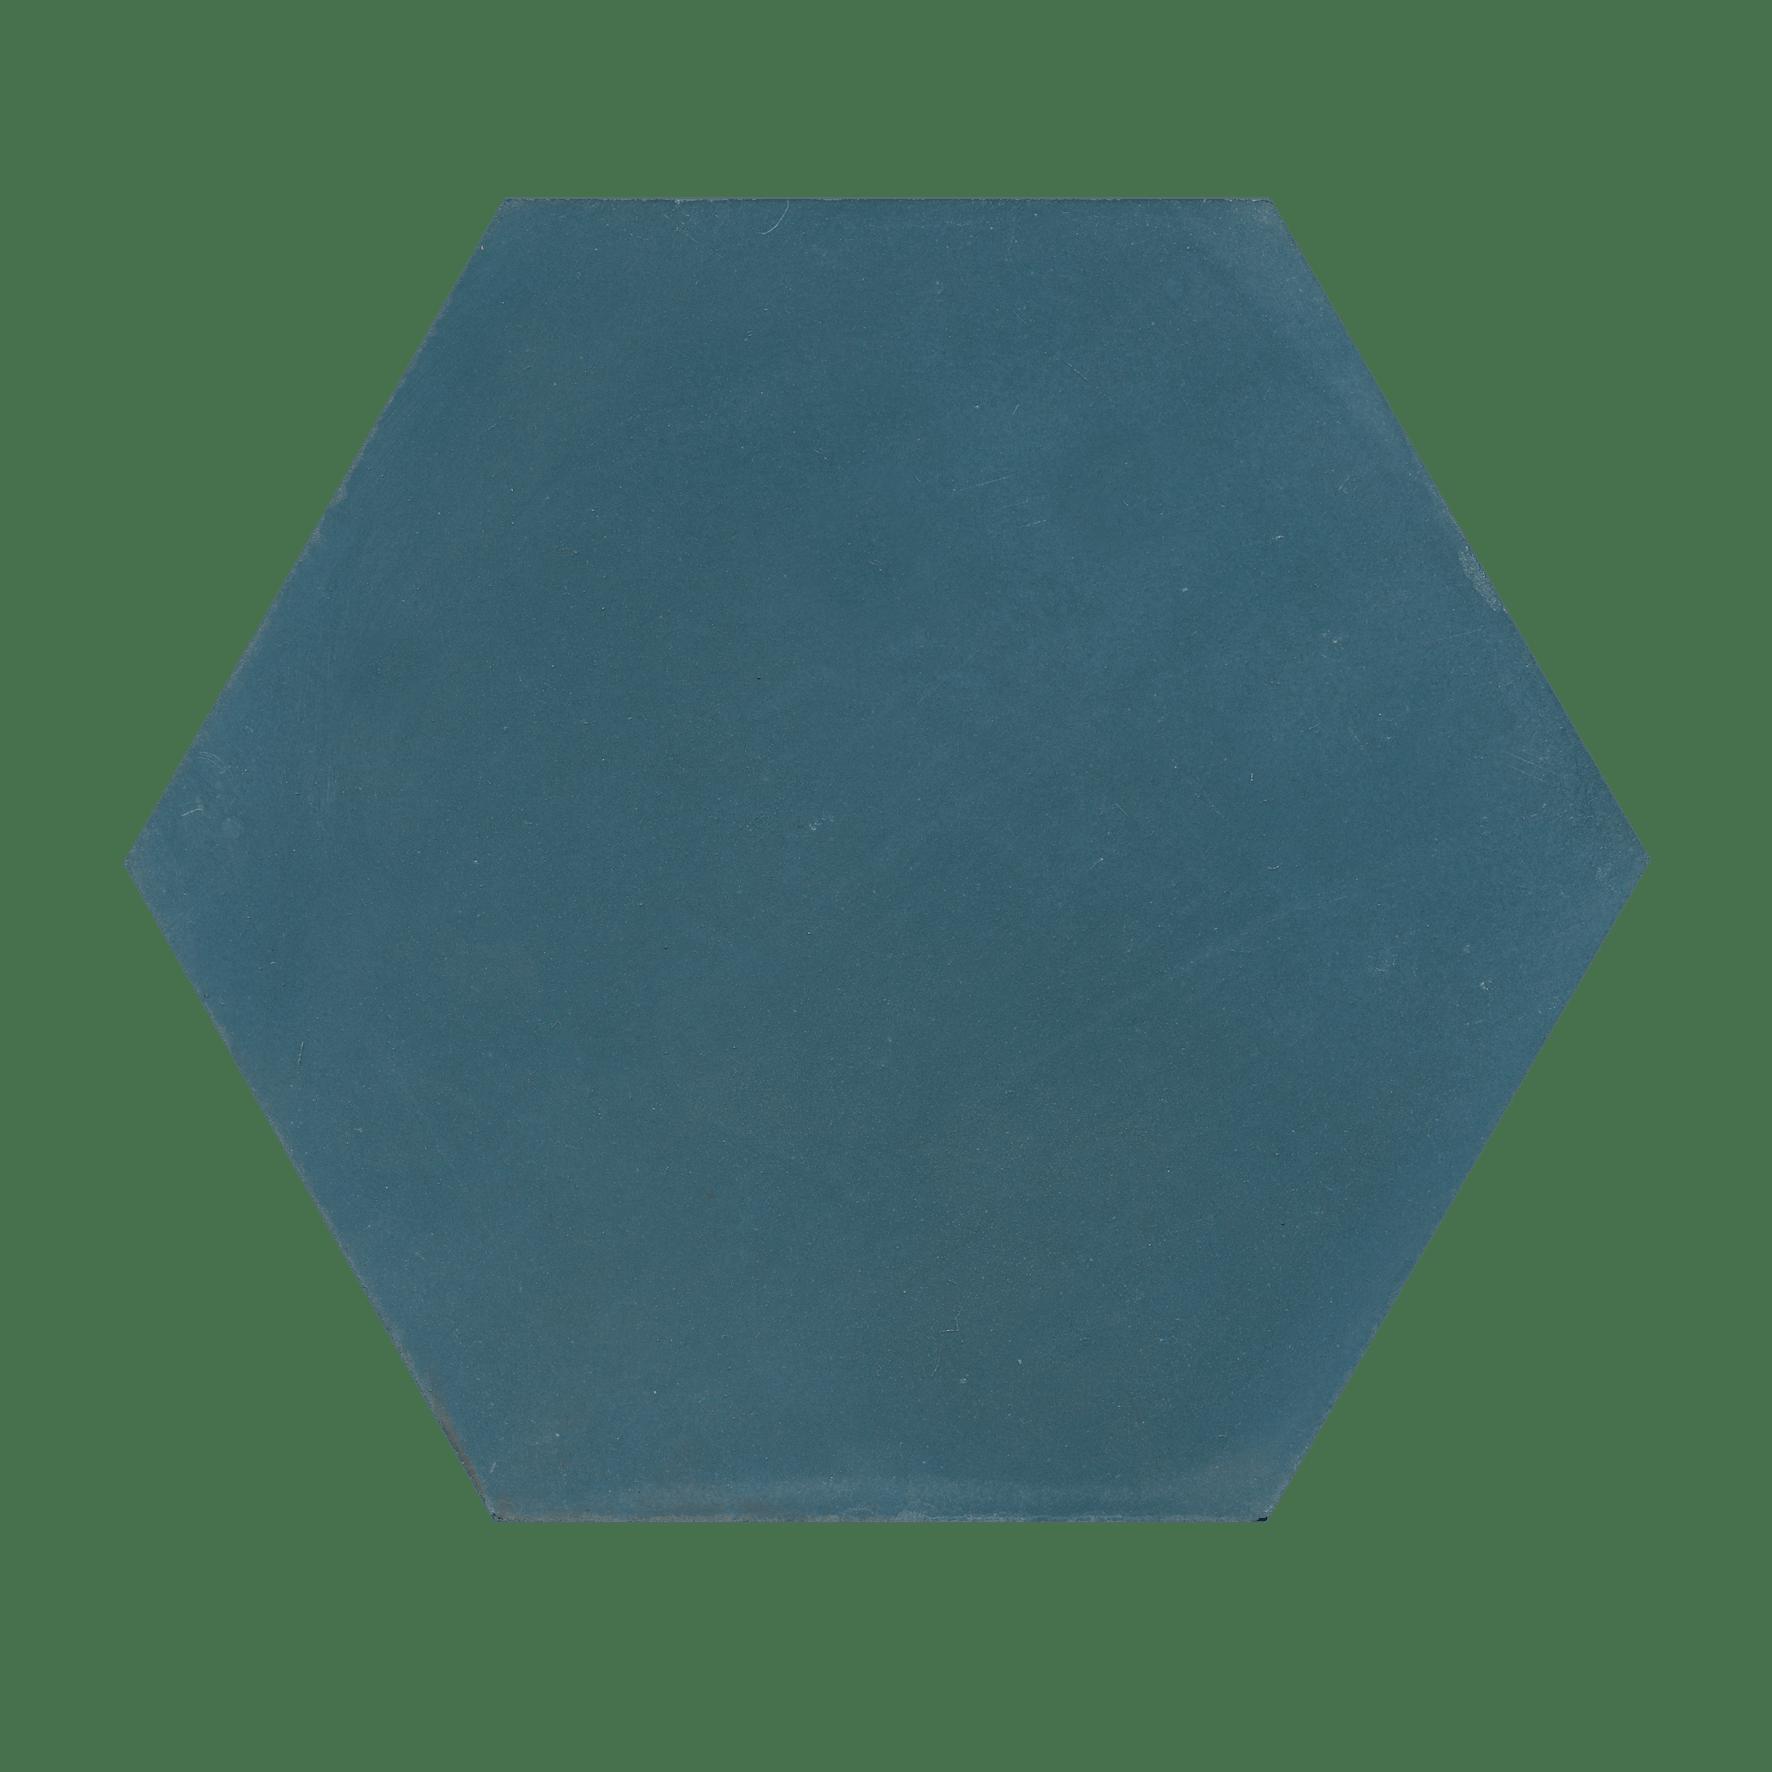 zementfliesen-terrazzofliesen-kreidefarbe-terrazzo-fugenlos-viaplatten-6-43 | 6-43